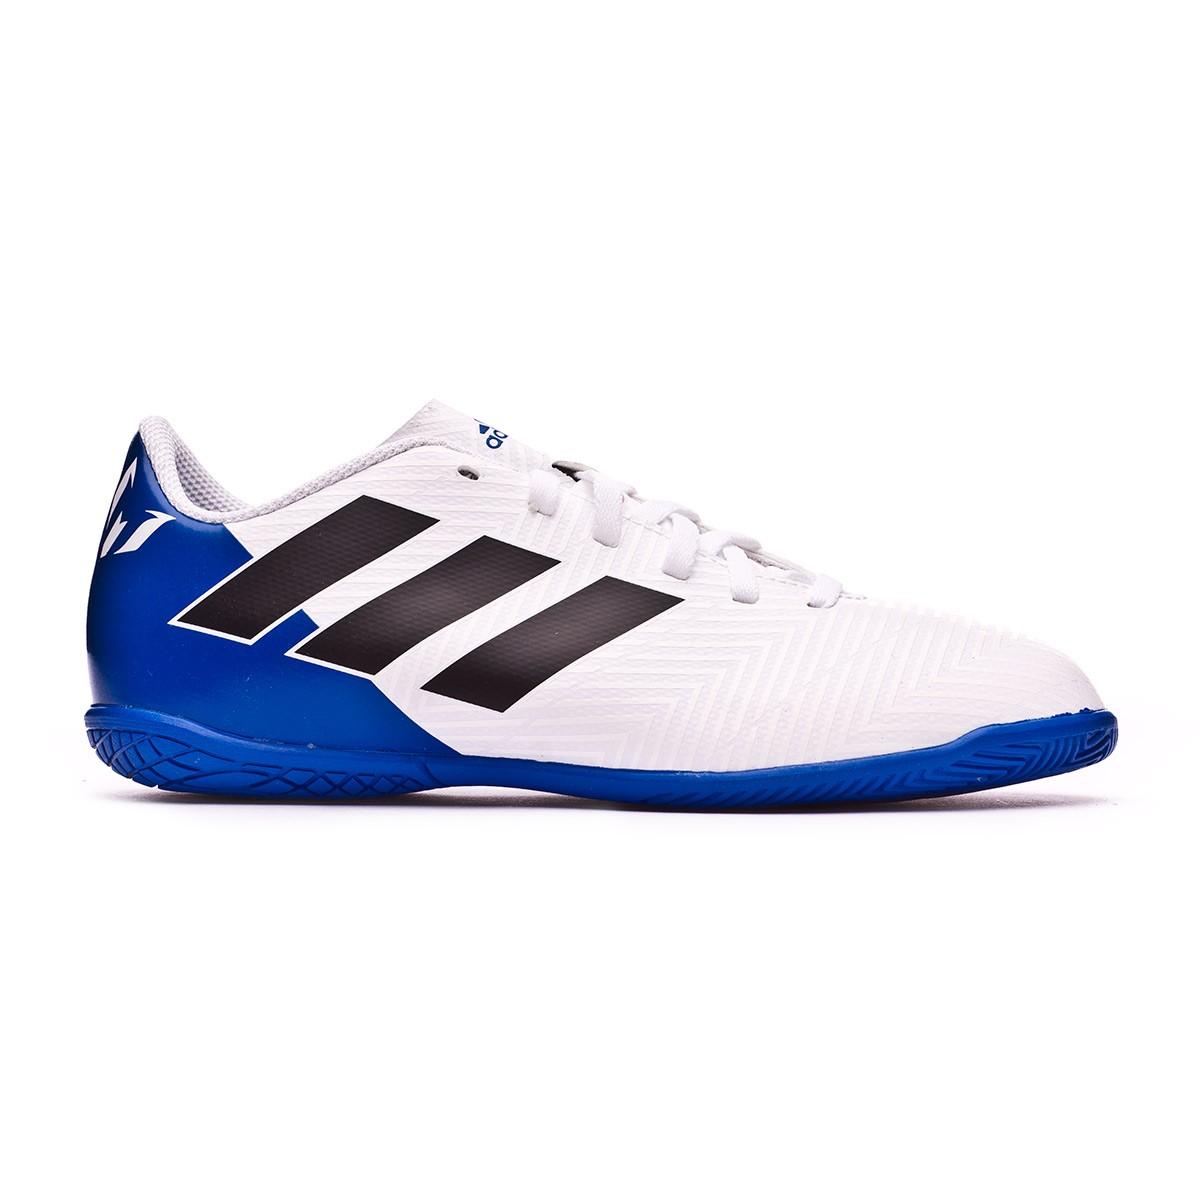 e39349d82785f Futsal Boot adidas Kids Nemeziz Messi Tango 18.4 IN White-Core  black-Football blue - Football store Fútbol Emotion